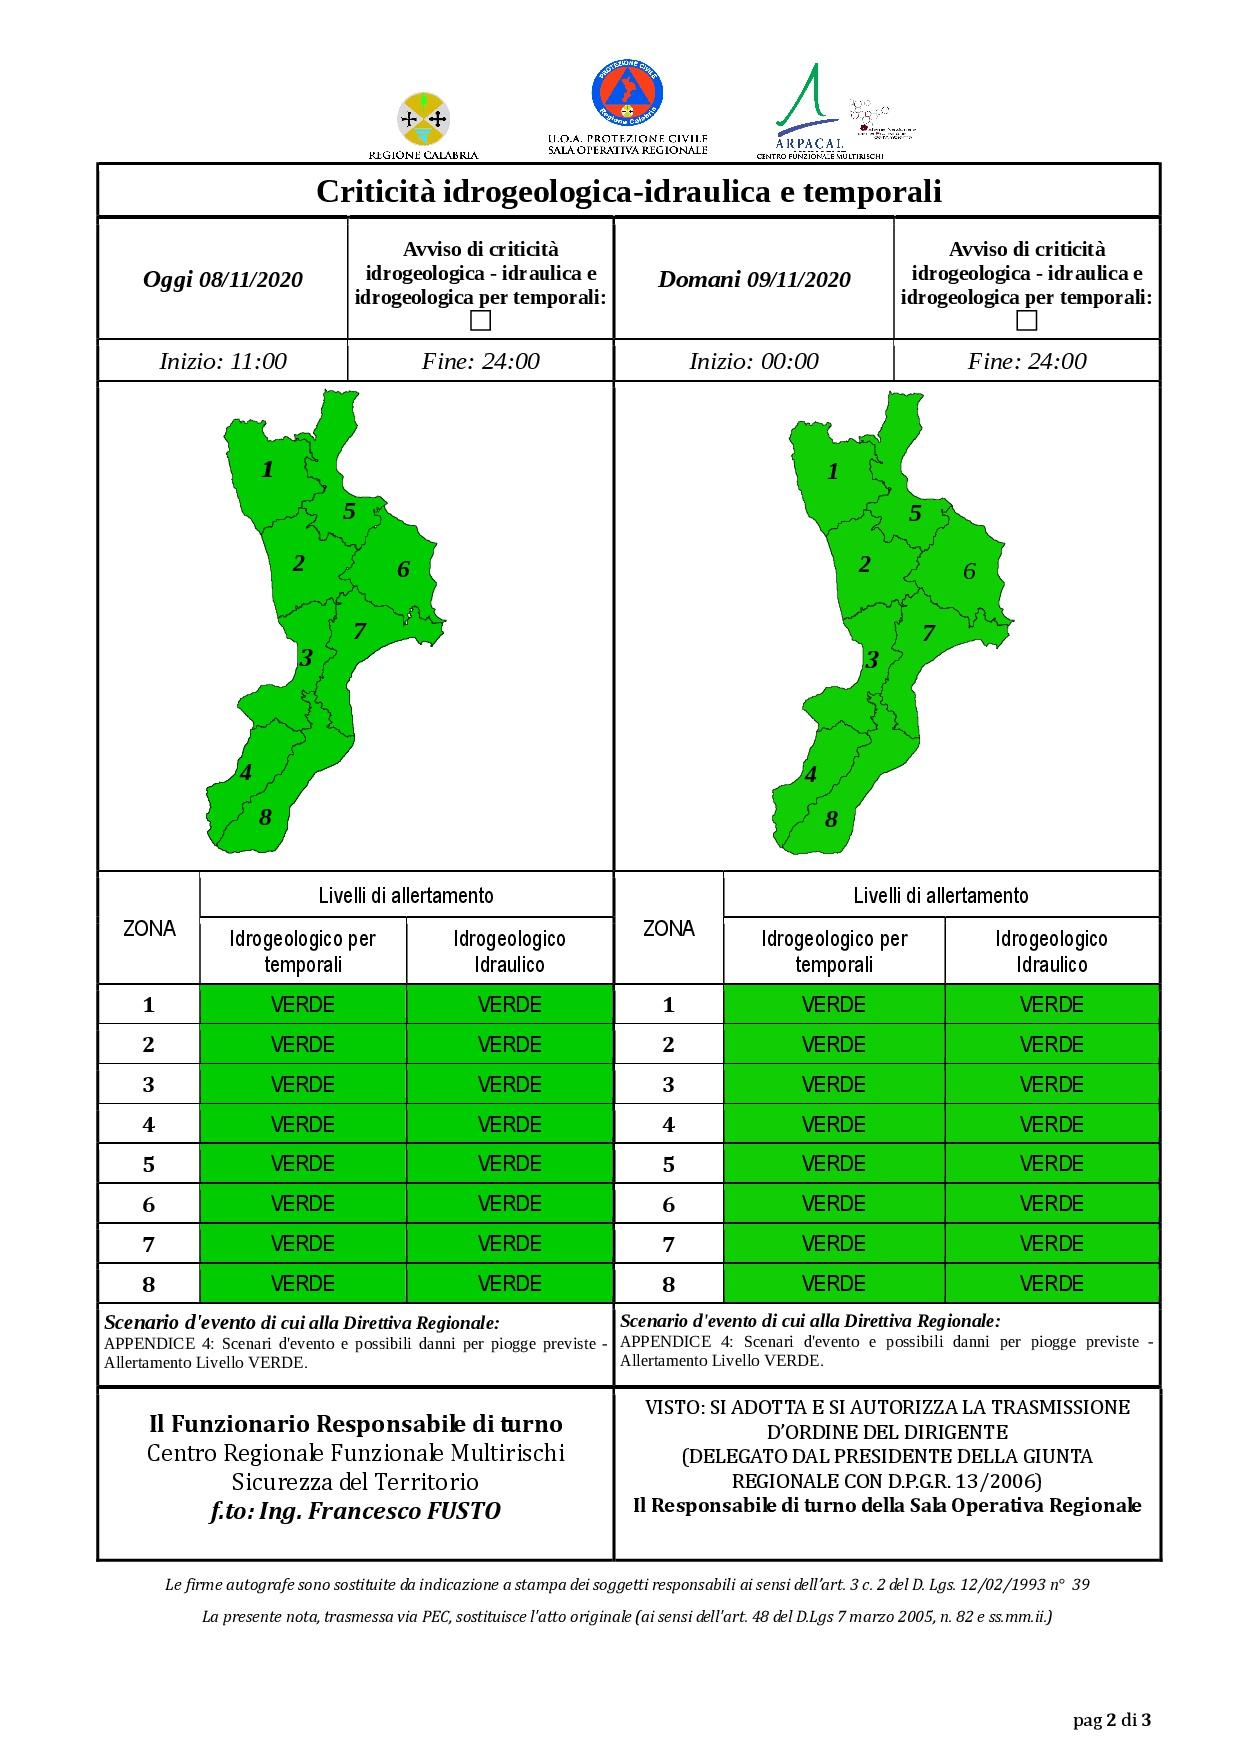 Criticità idrogeologica-idraulica e temporali in Calabria 08-11-2020